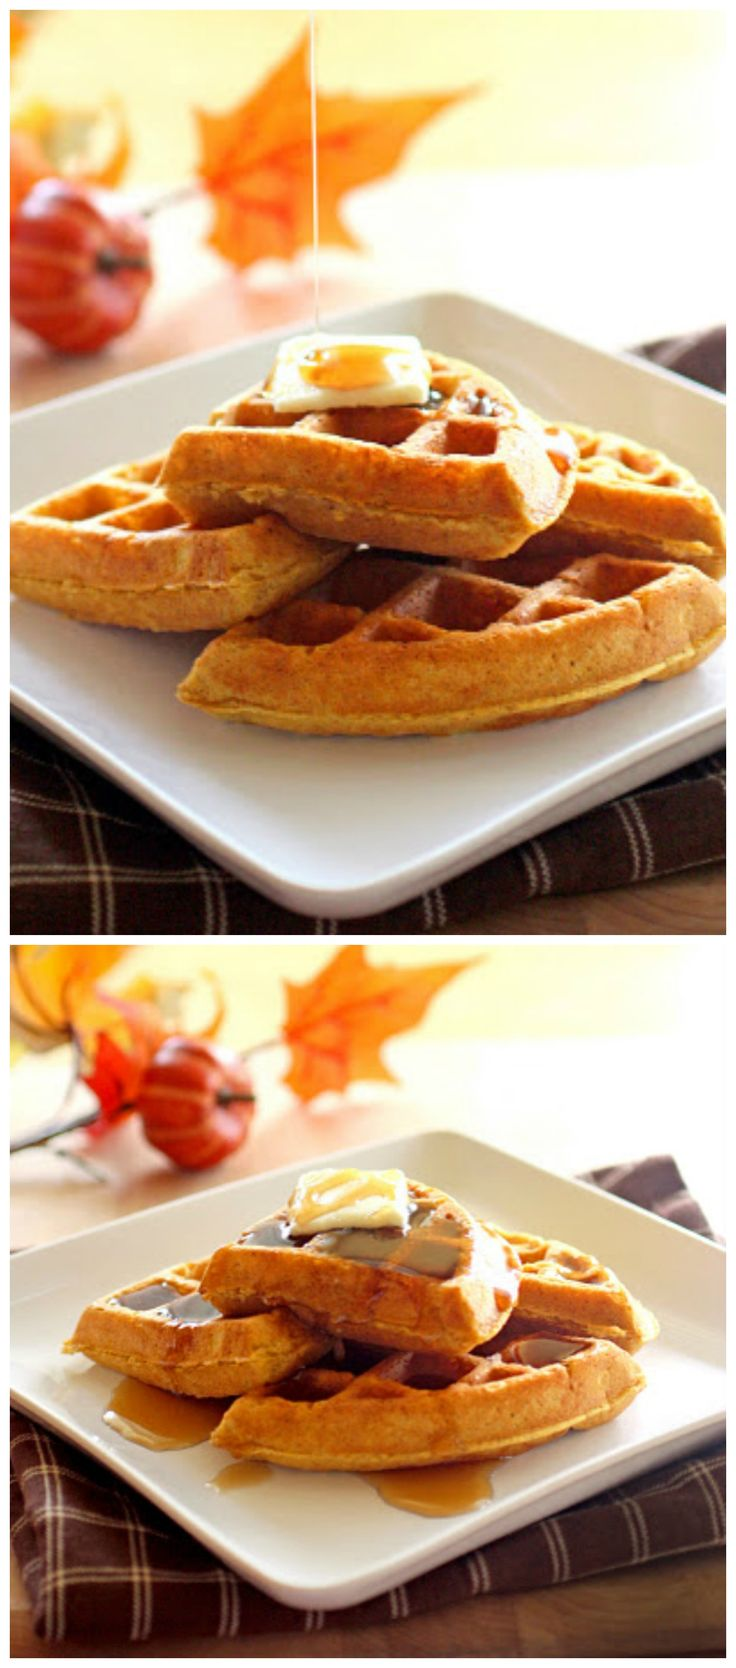 Pumpkin Waffles - crisp waffles that smell like fall. www.the-girl-who-ate-everything.com